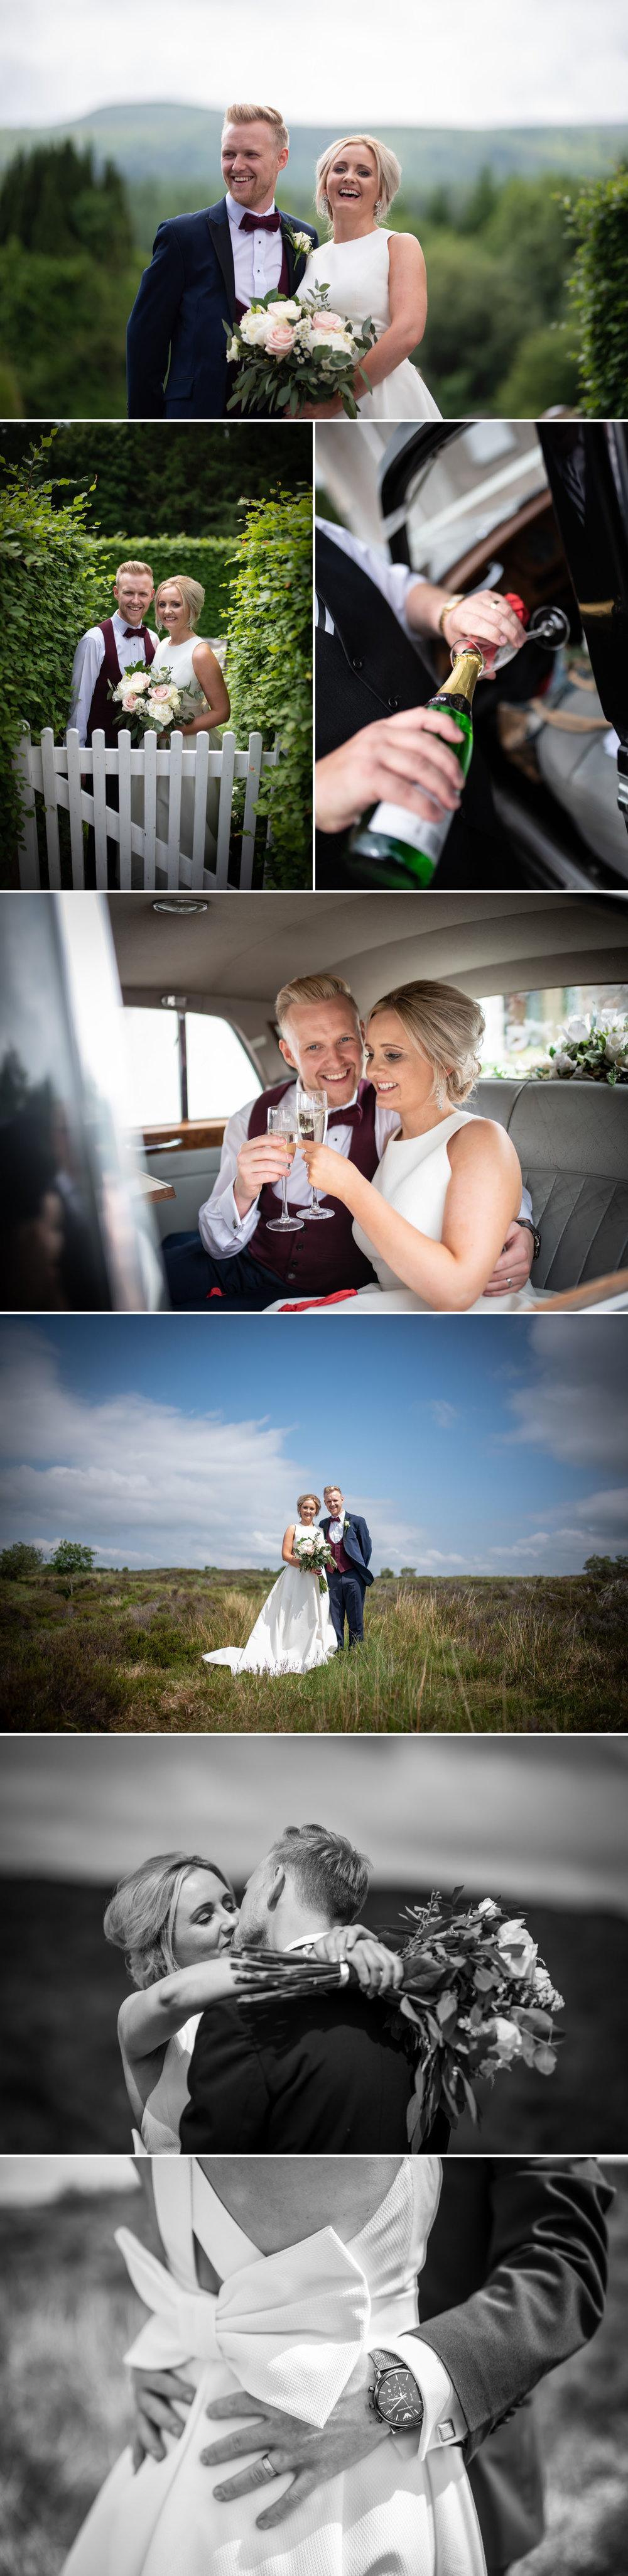 best wedding photographers northern ireland 11.jpg